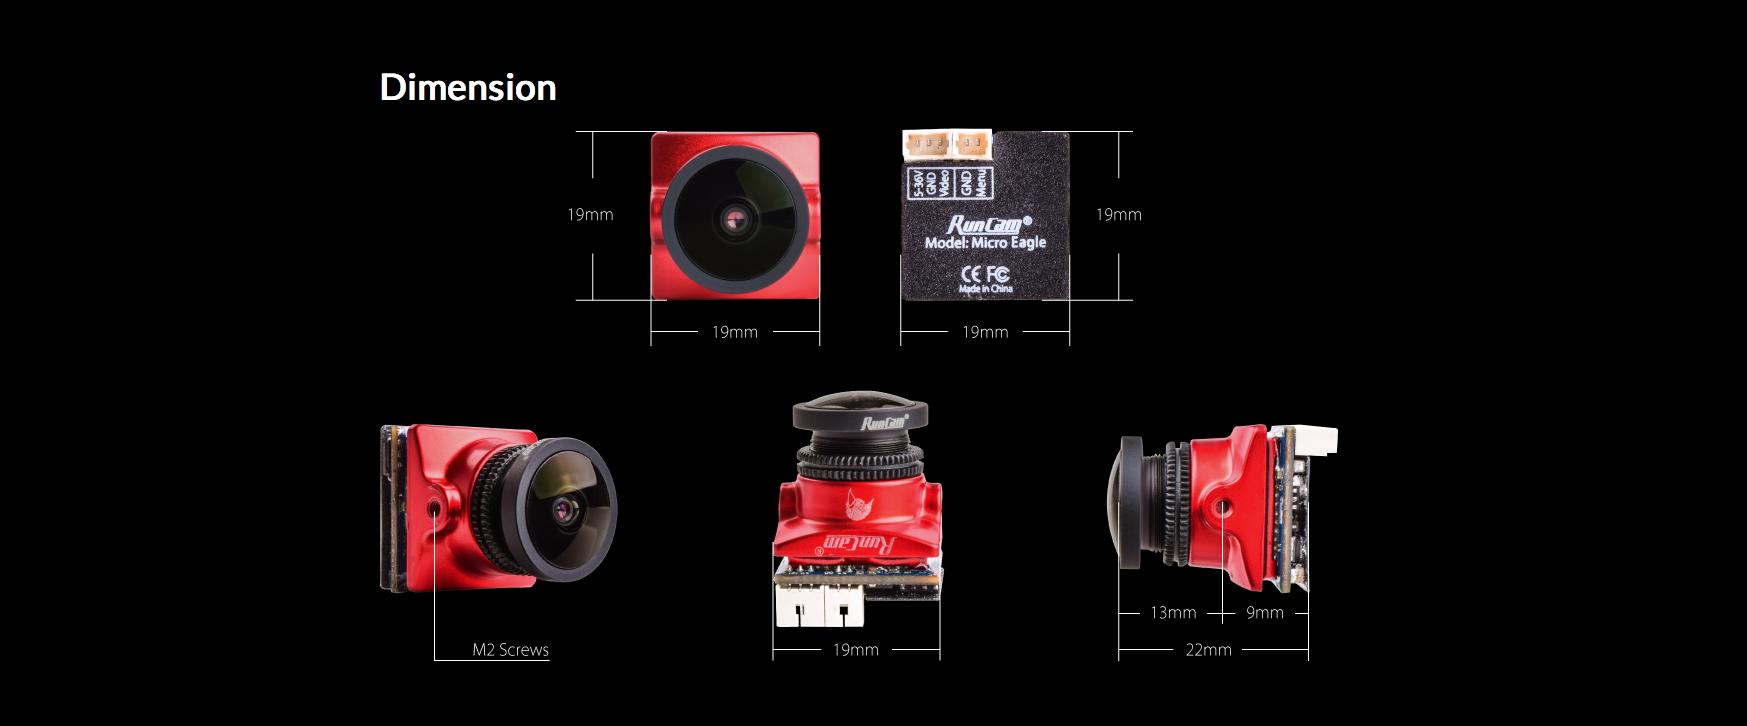 runcam-micro-eagle-dimensions.png